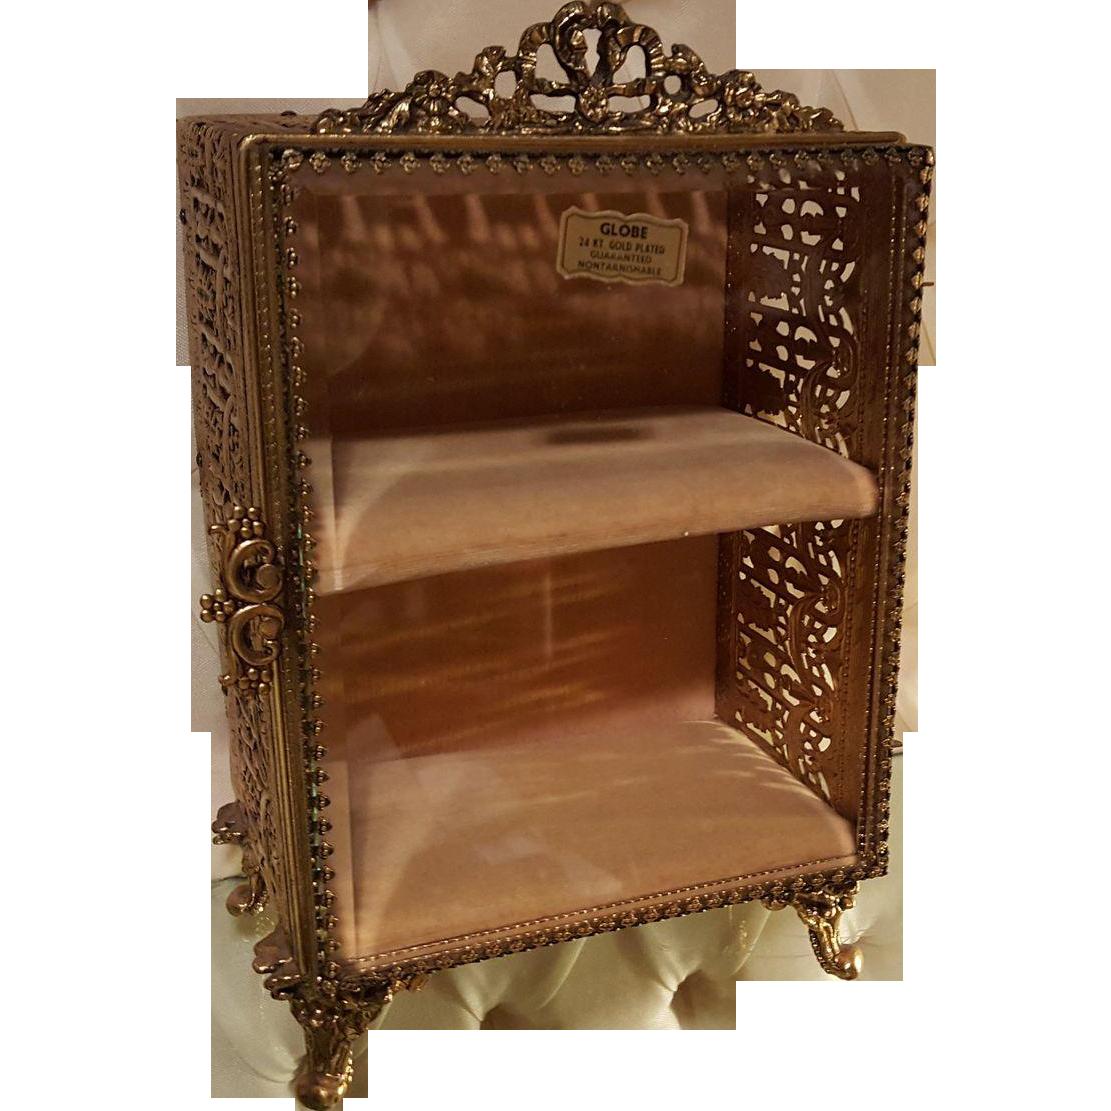 fab vintage double shelf vitrine jewelry trinket box. Black Bedroom Furniture Sets. Home Design Ideas